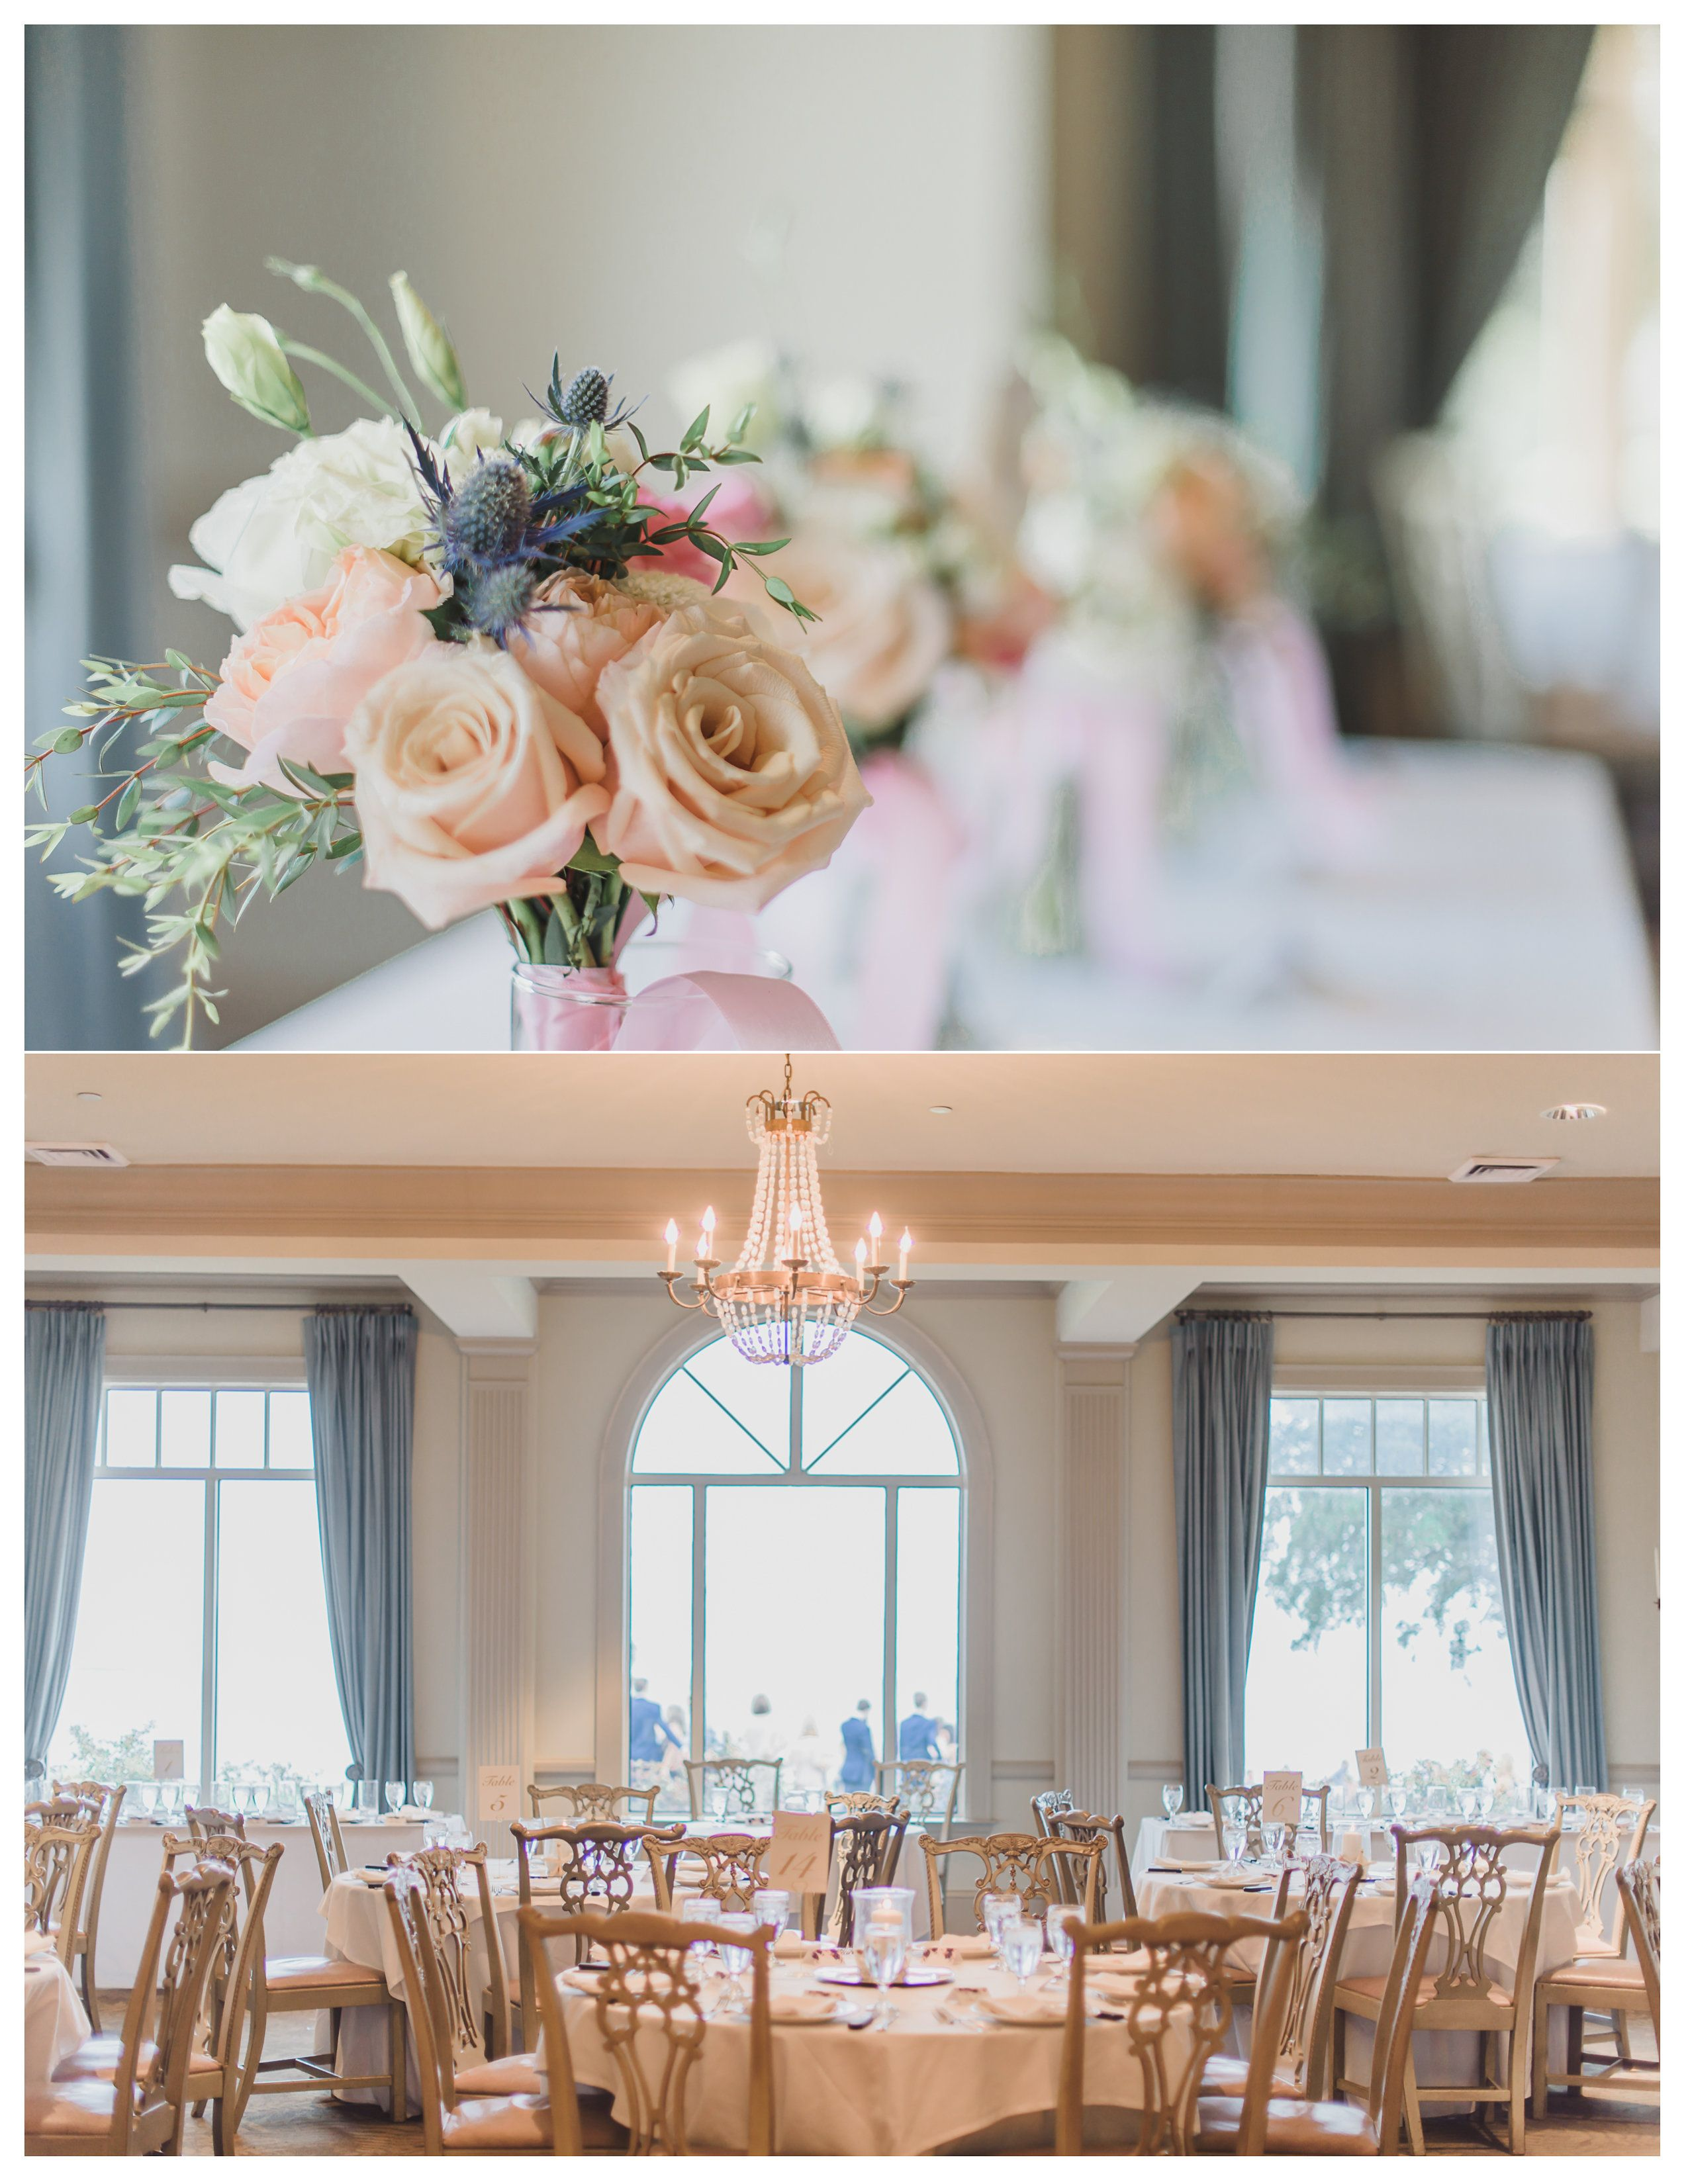 Wedding decorations list september 2018 Hensley wedding September nd   Elegant and breezy wedding